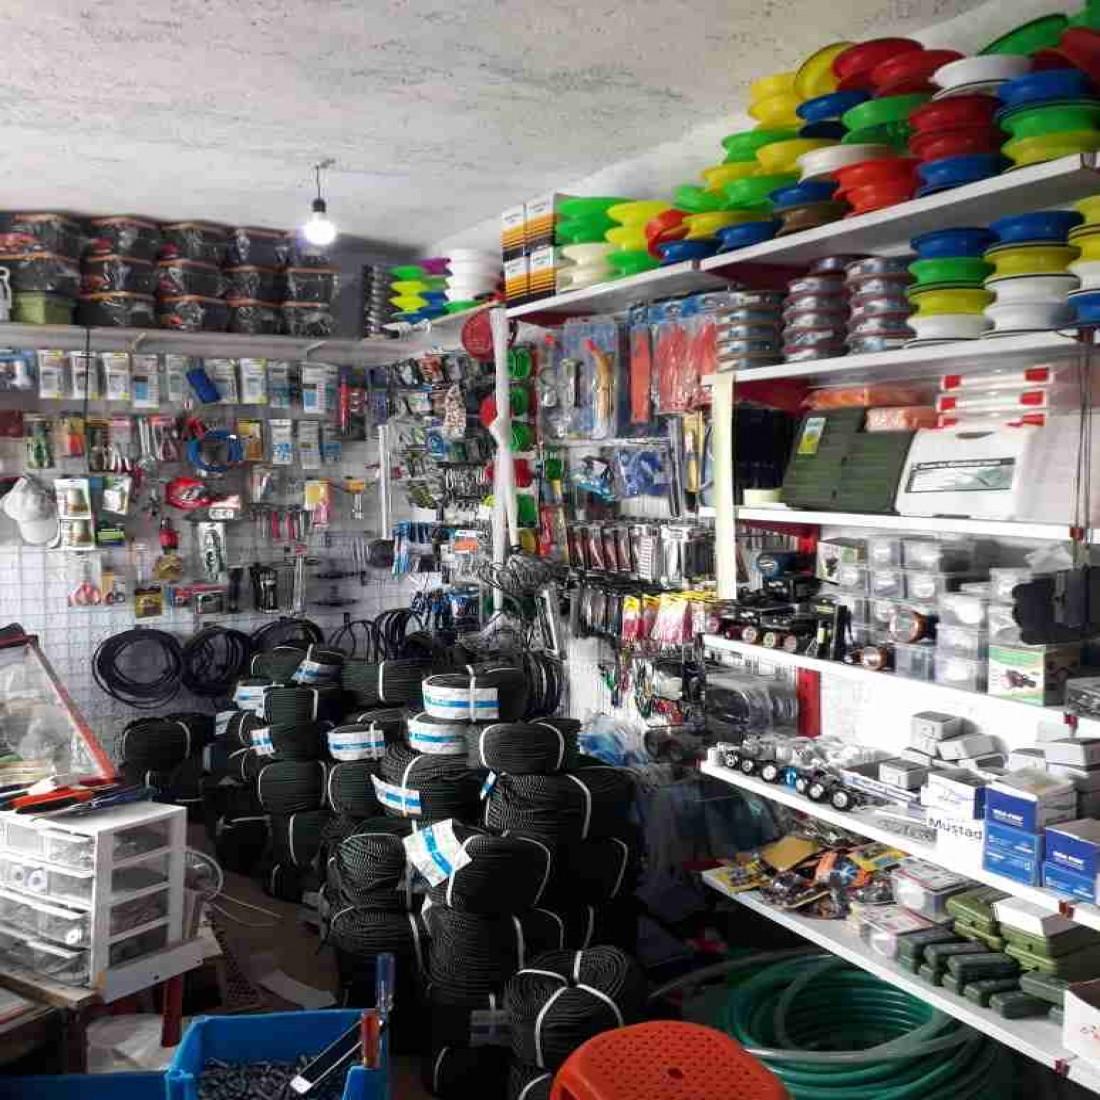 فروشگاه لوازم صیادی حسن